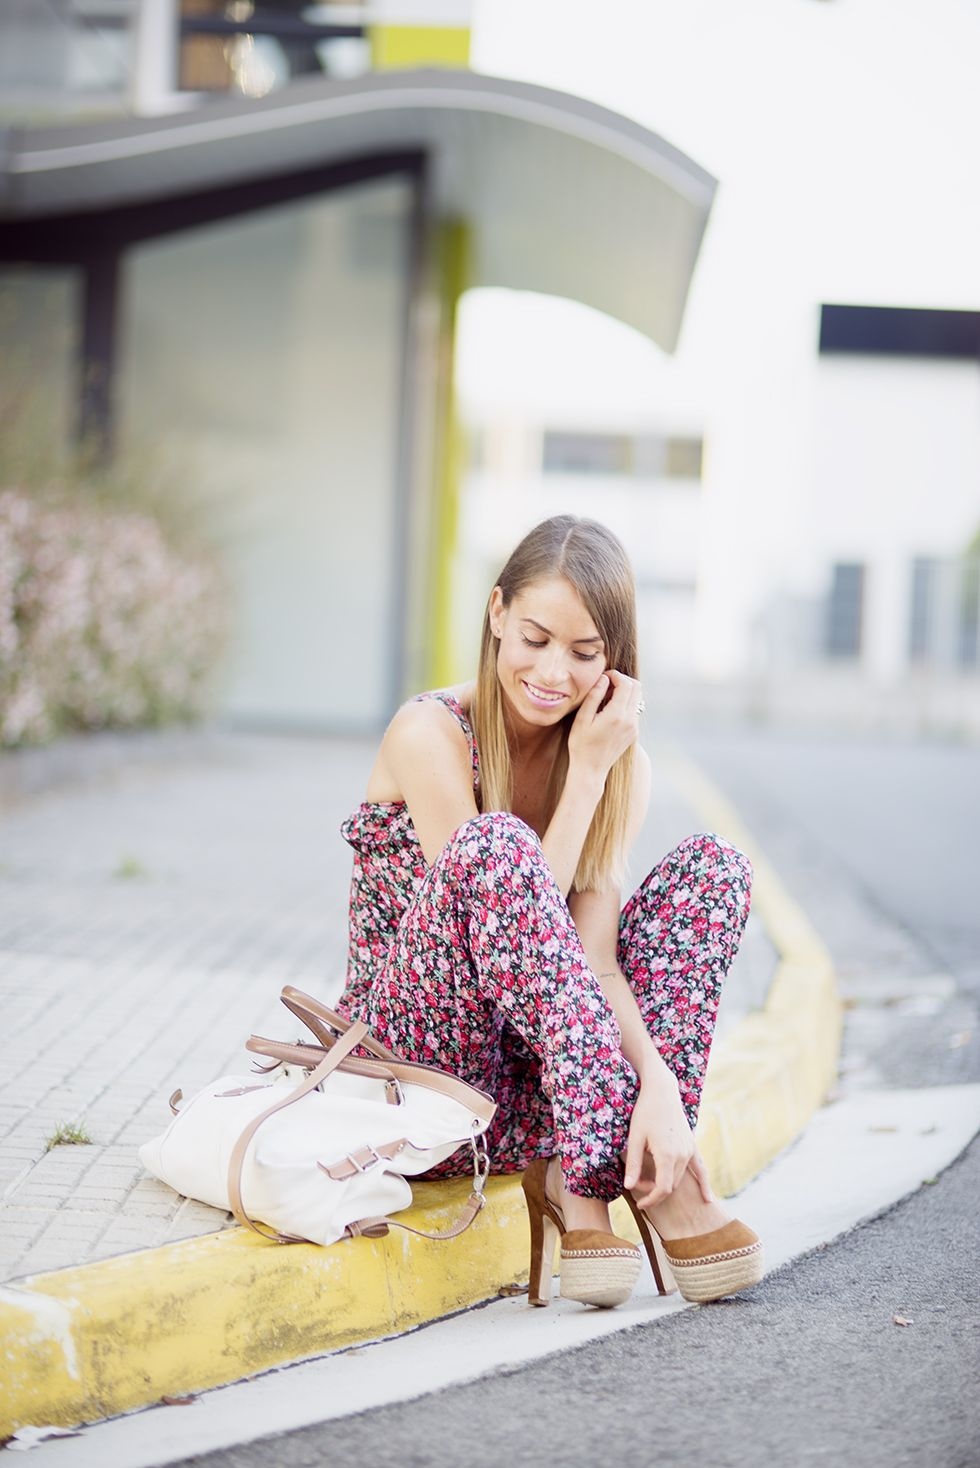 Flowers #blogsmoda #fashionblog #lookbook #smmerlook #flowerslook #streetstyle #tous